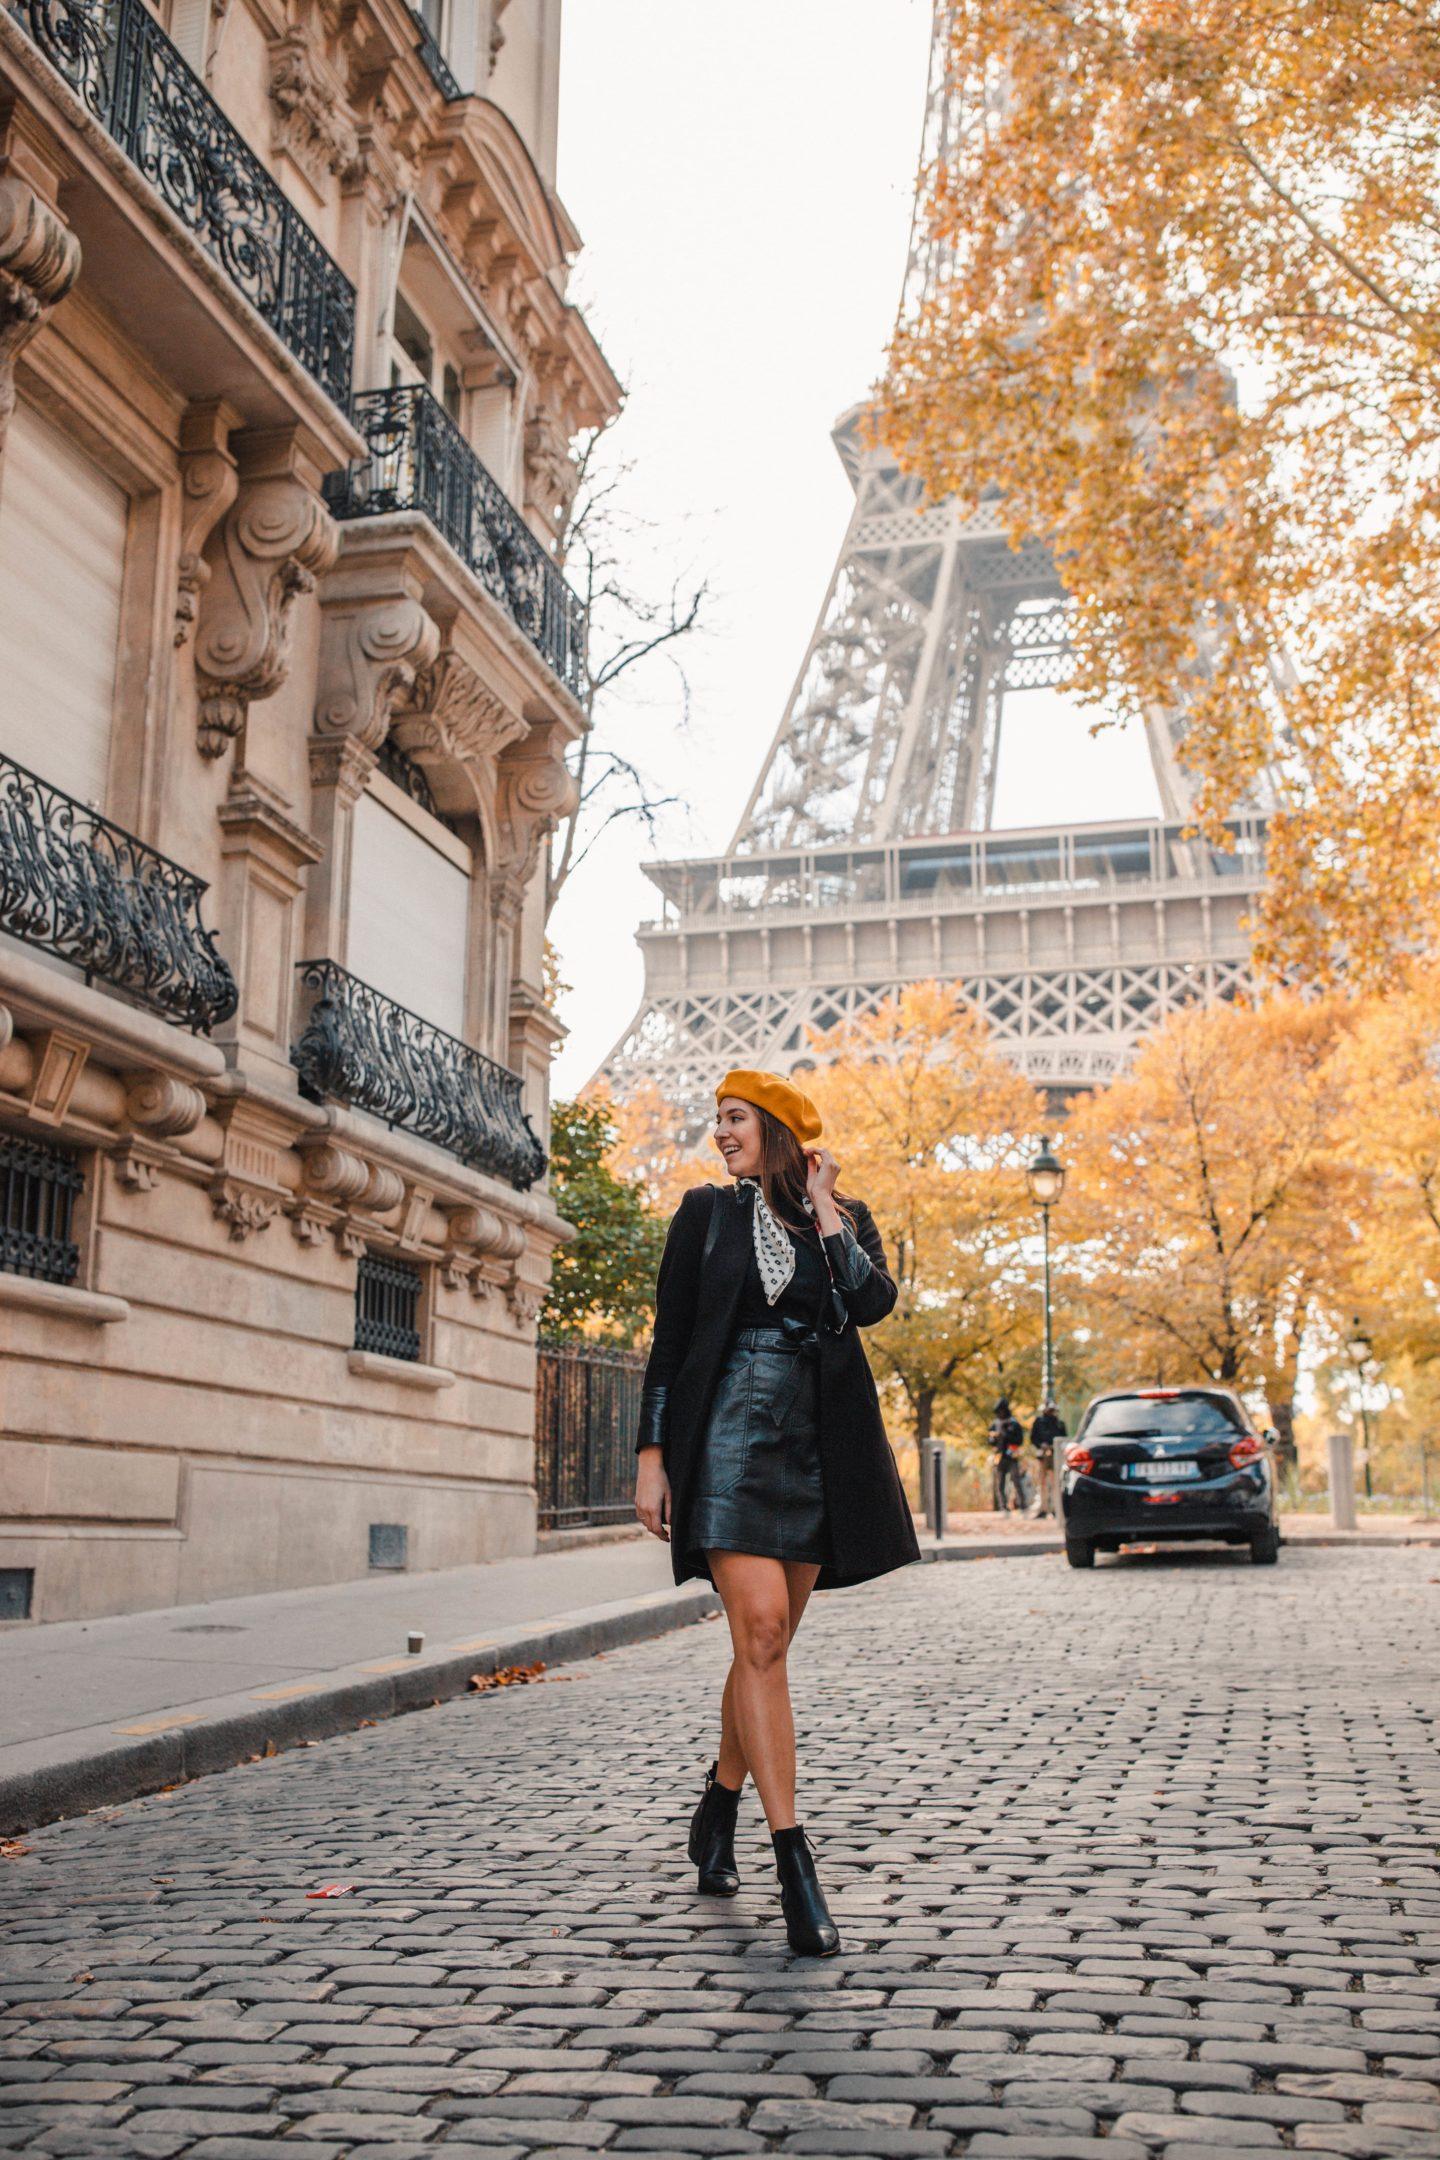 The Best Eiffel Tower Photo Spots   7 Secret Places to View the Eiffel Tower